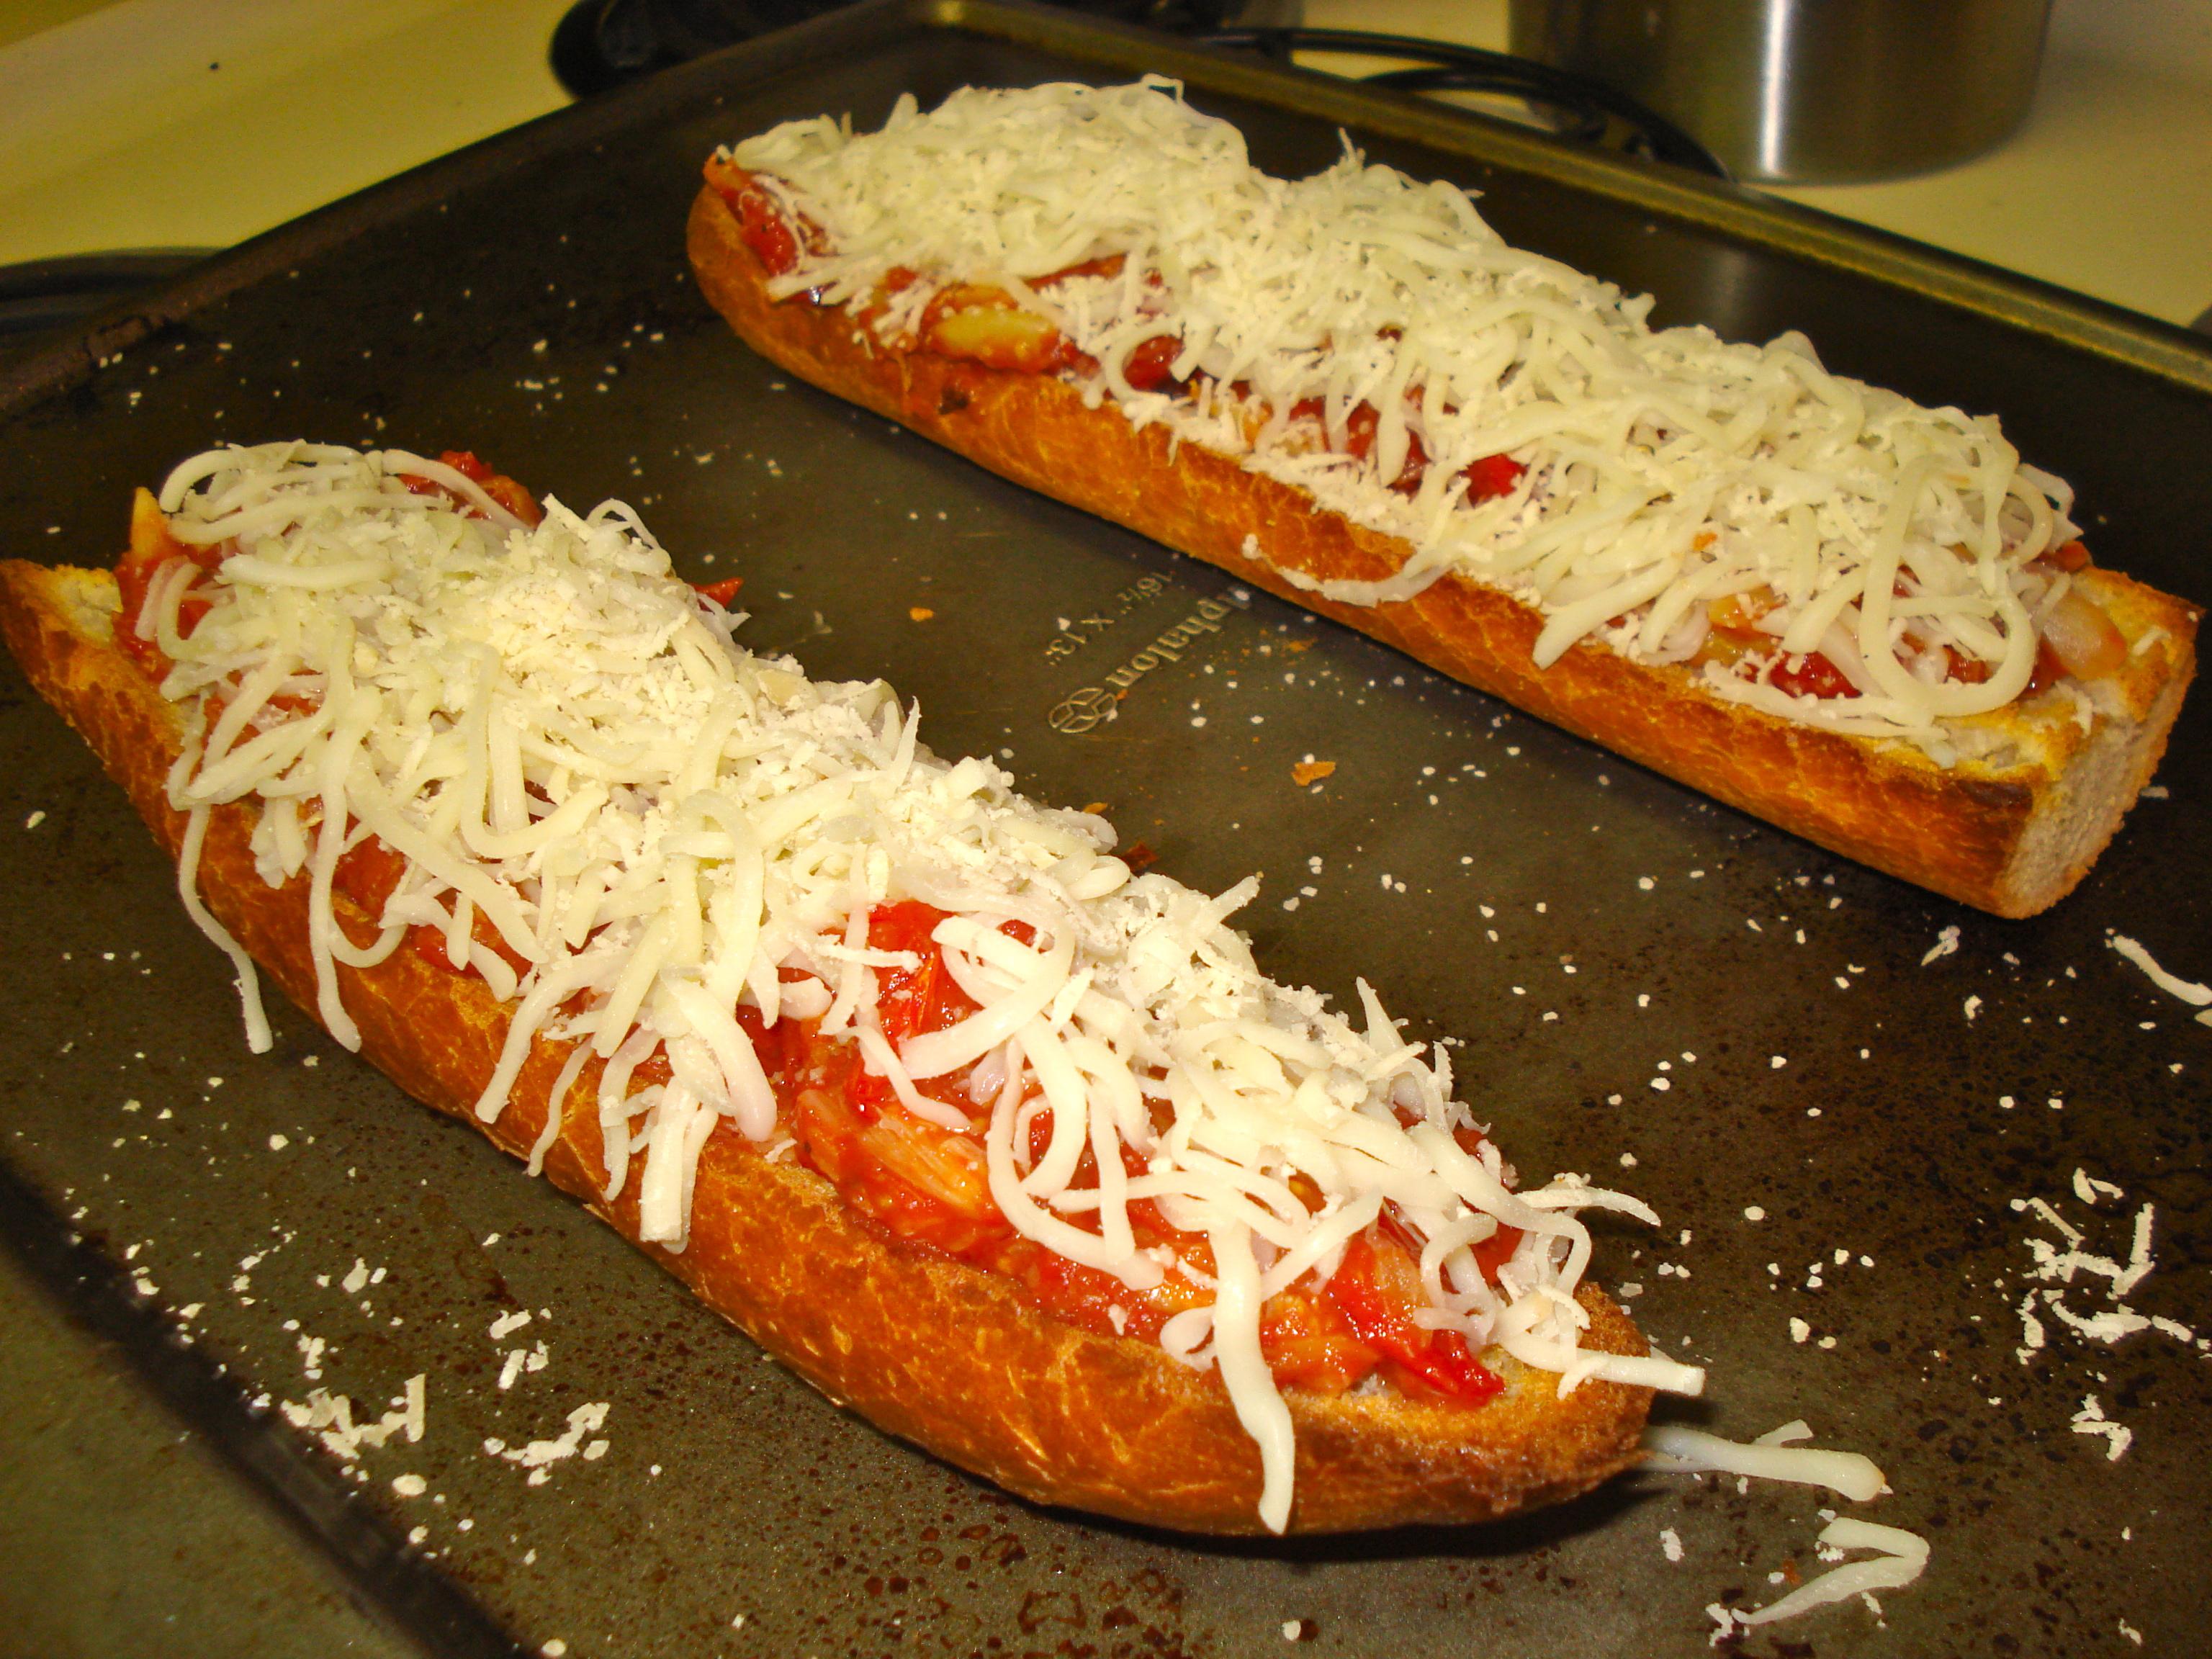 Pre-ovened pizzas.